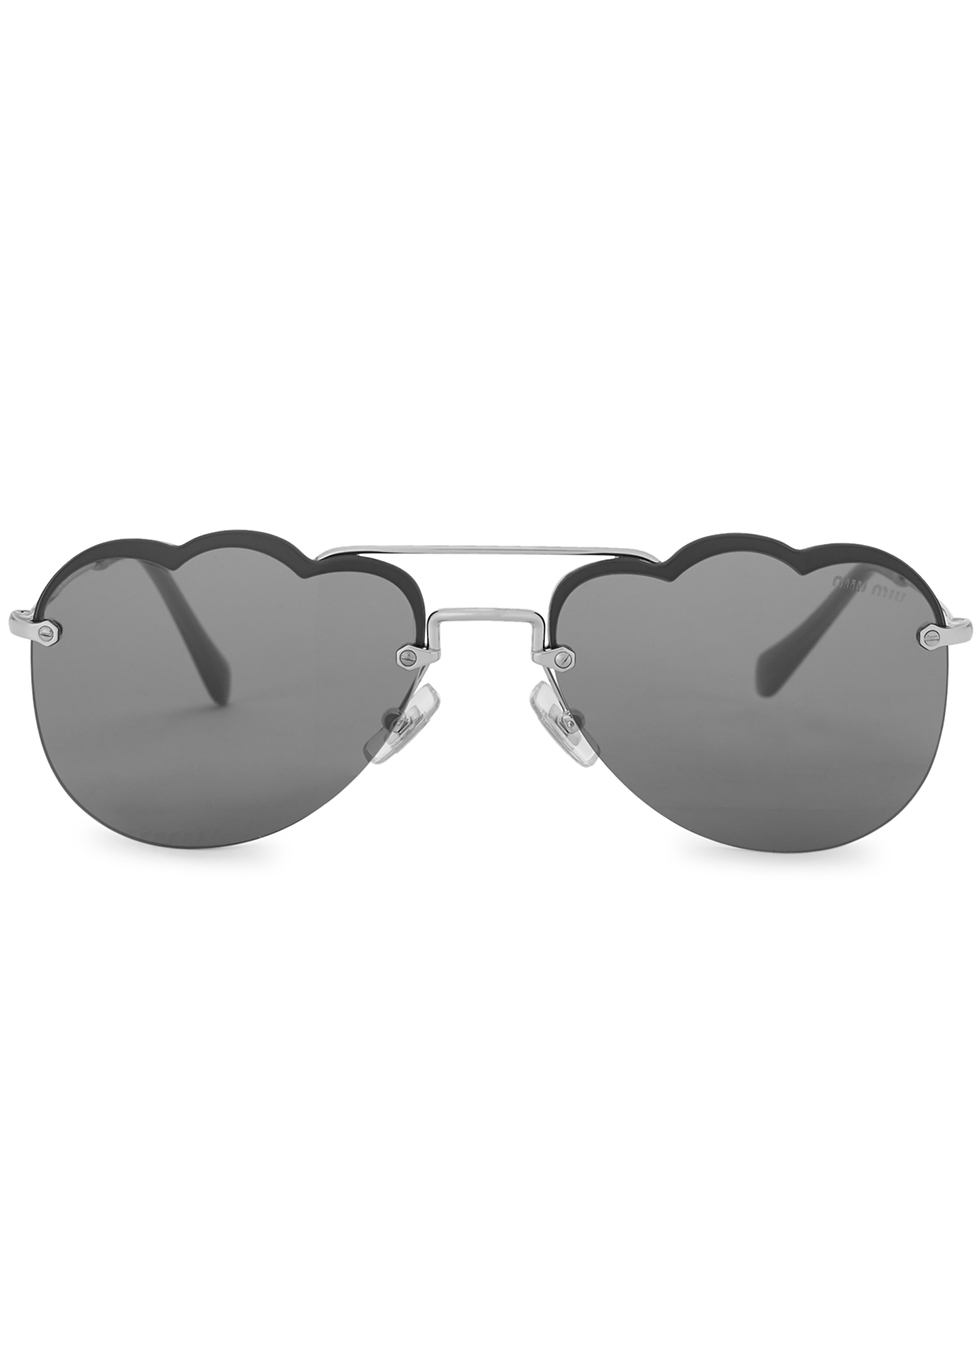 Grey scalloped aviator-style sunglasses - Miu Miu